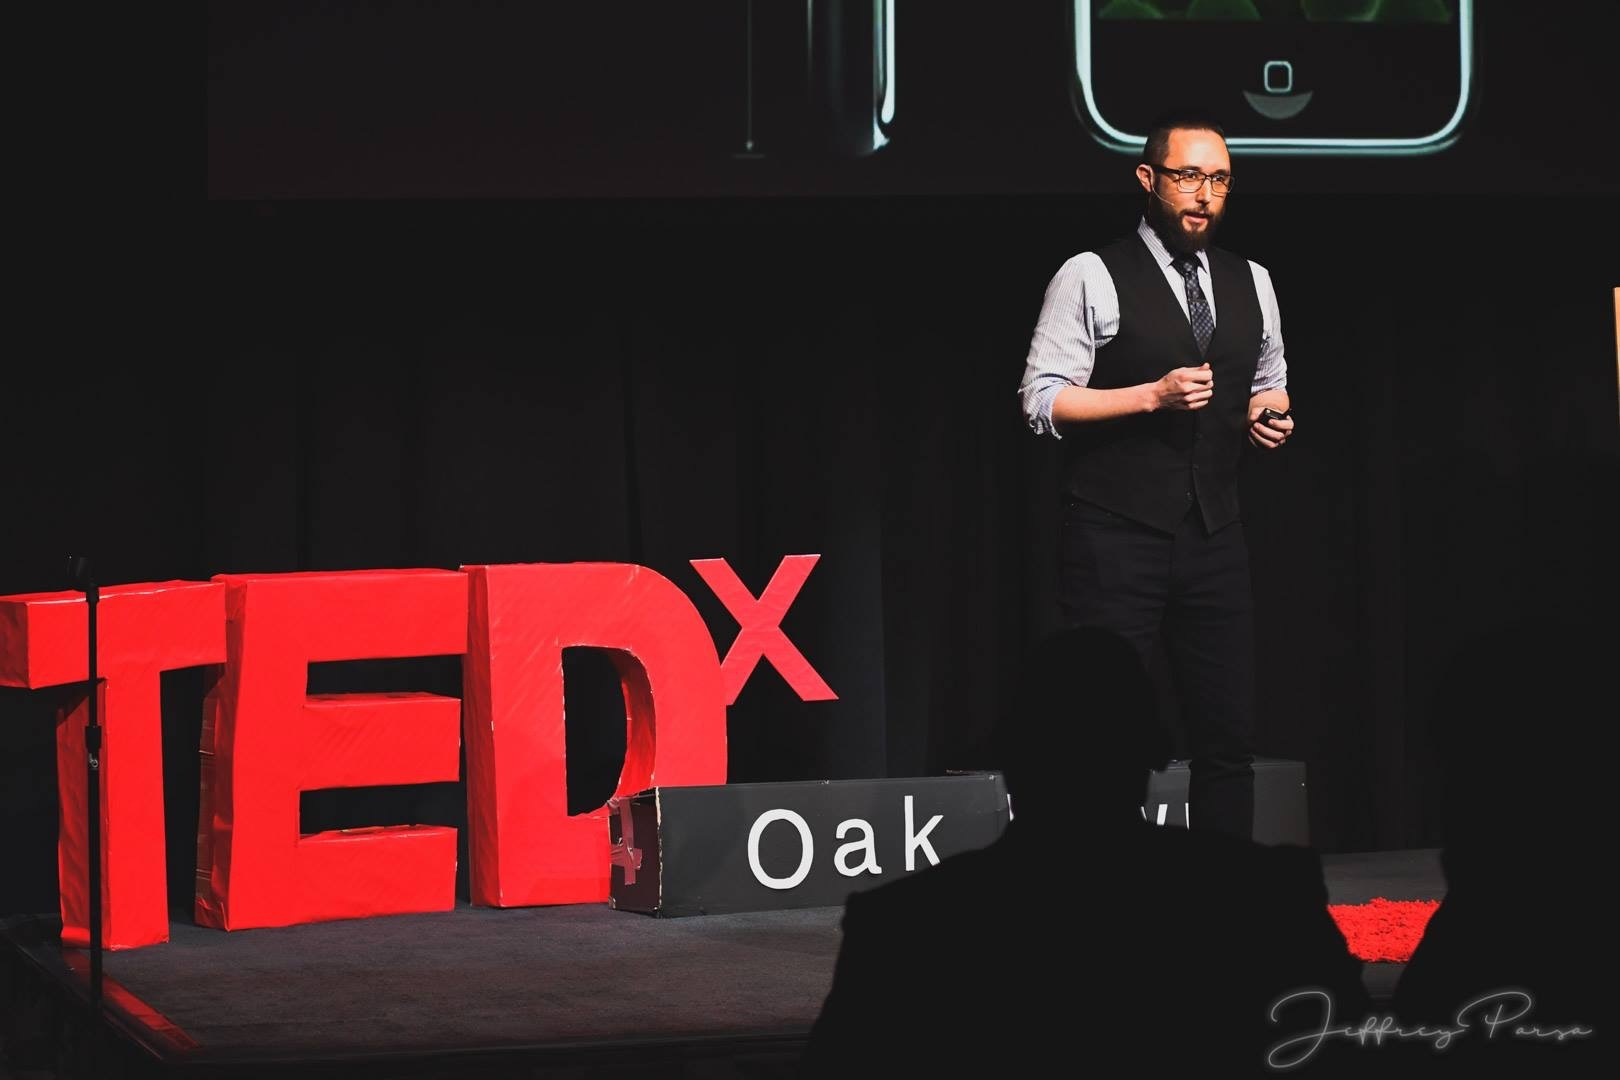 Tom Ewdards TEDx Professional photo3